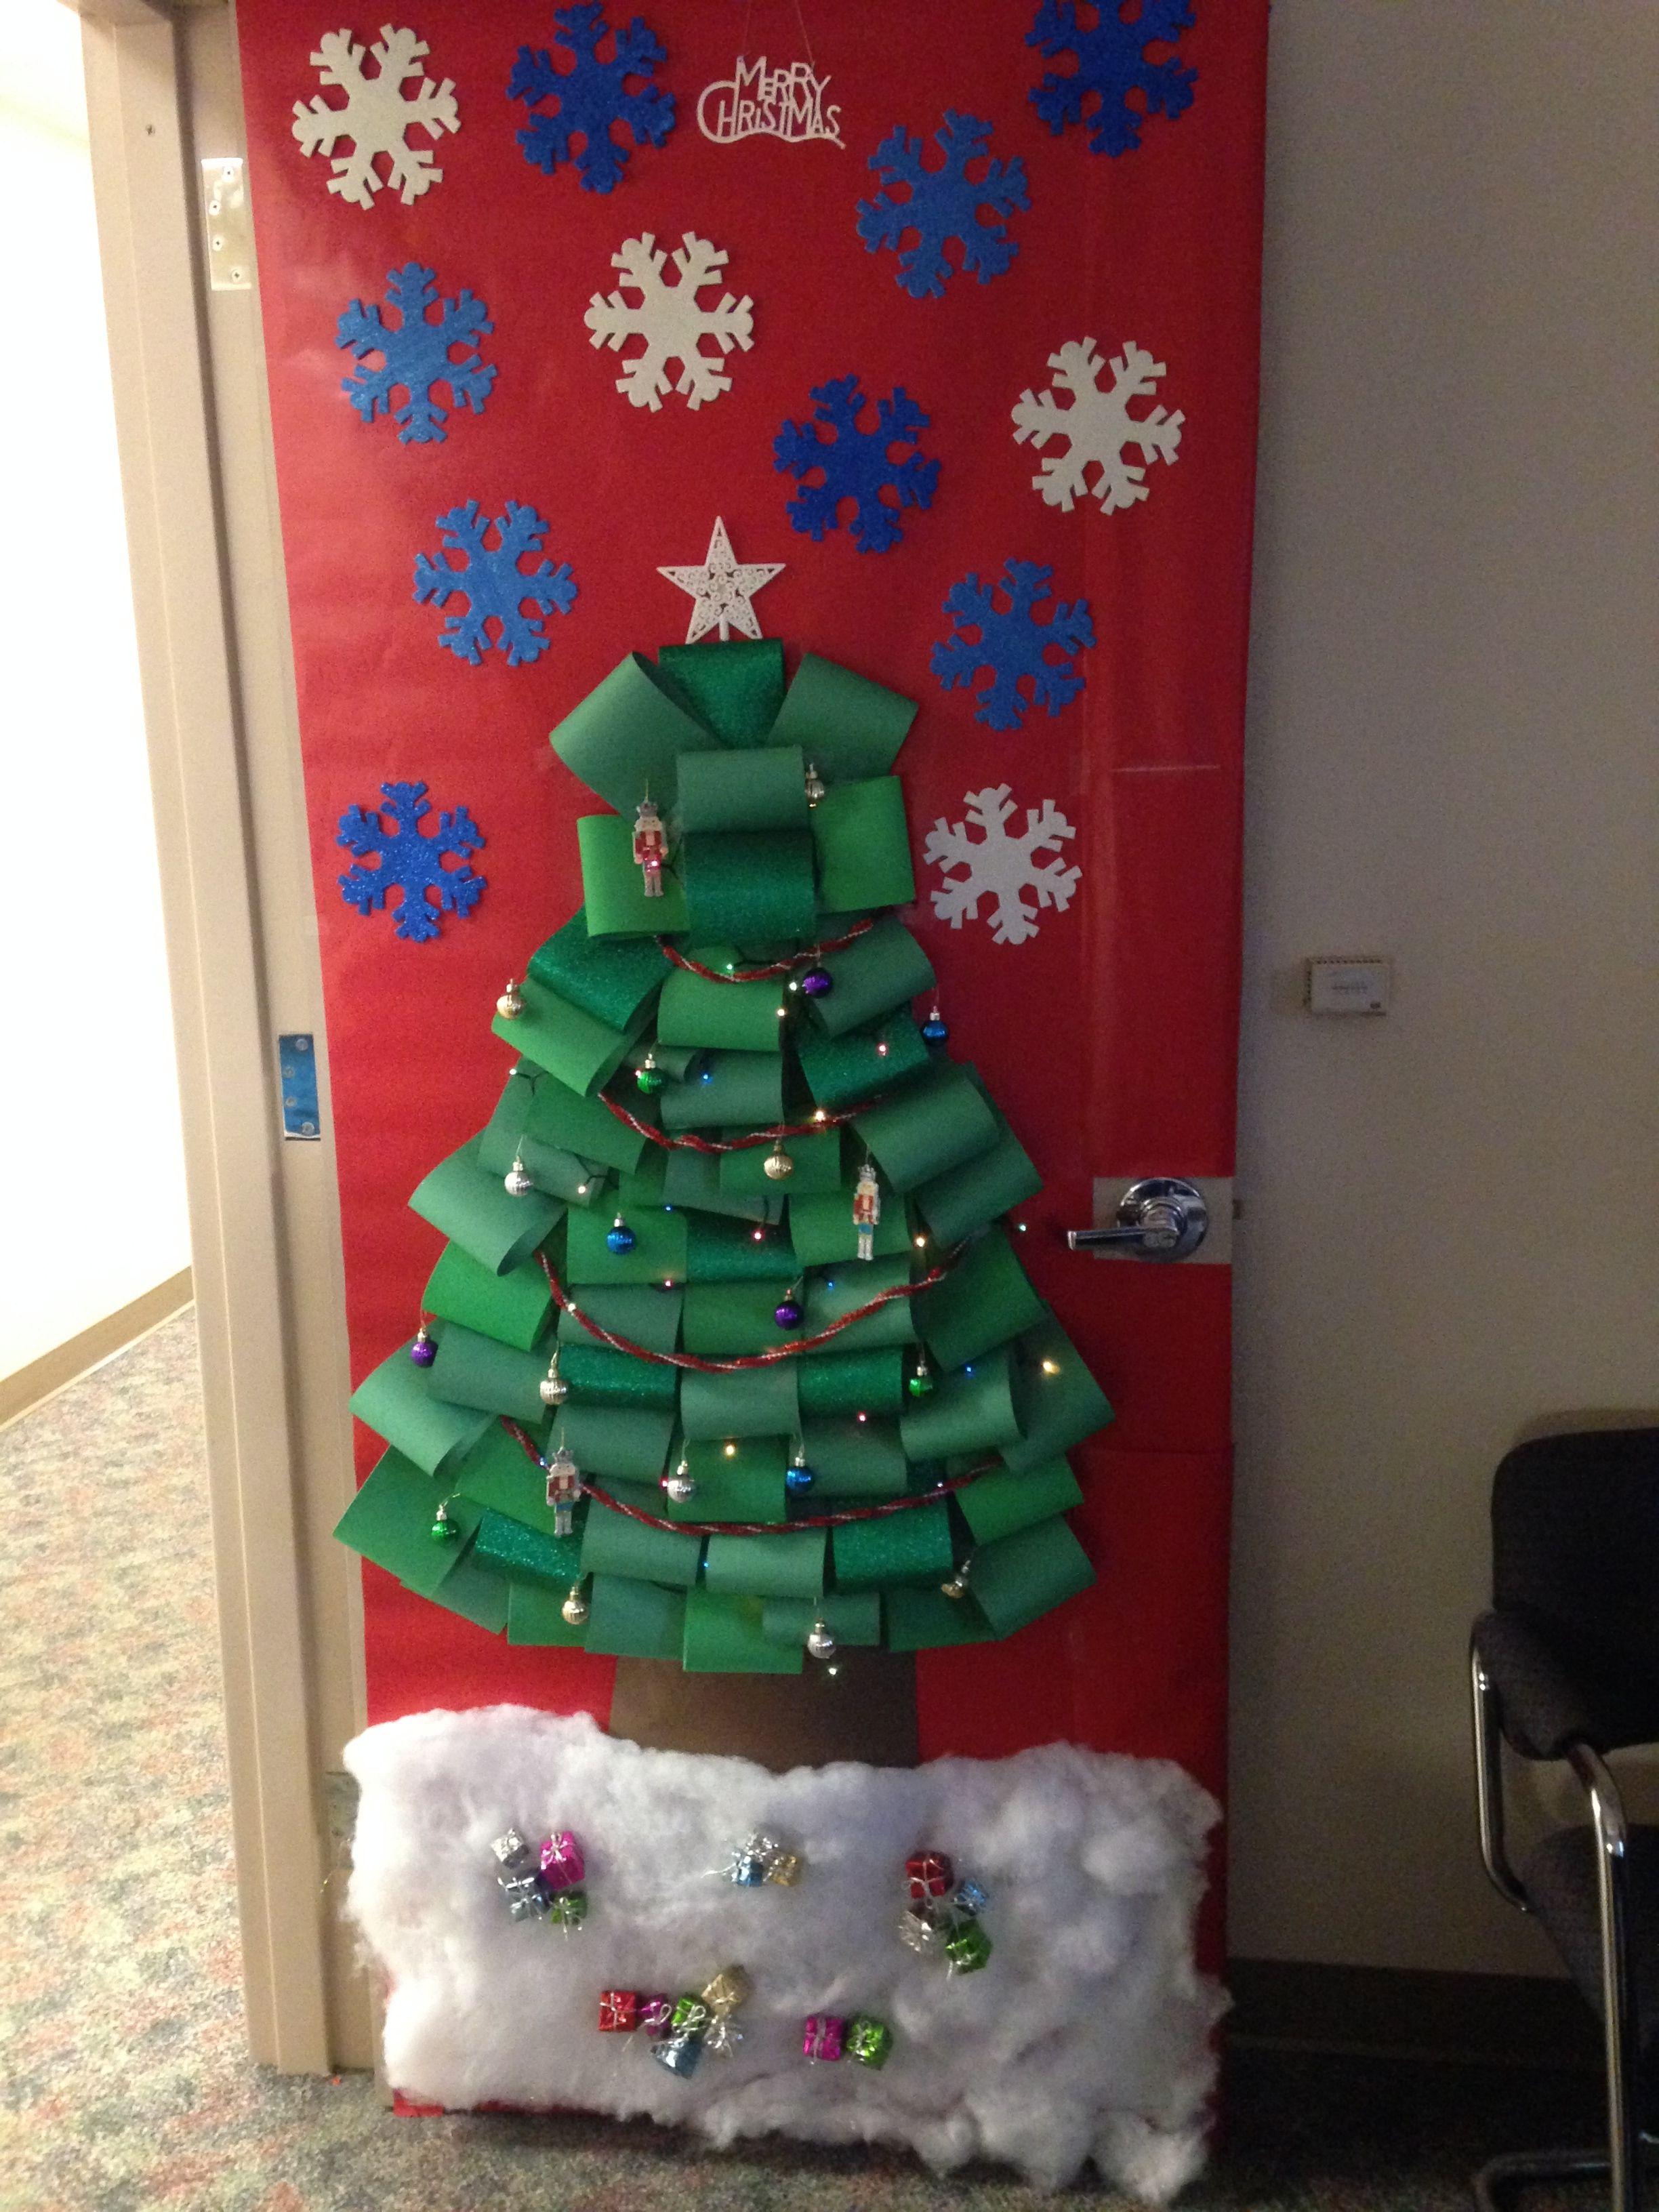 Office Christmas door decoration contest. Christmas tree